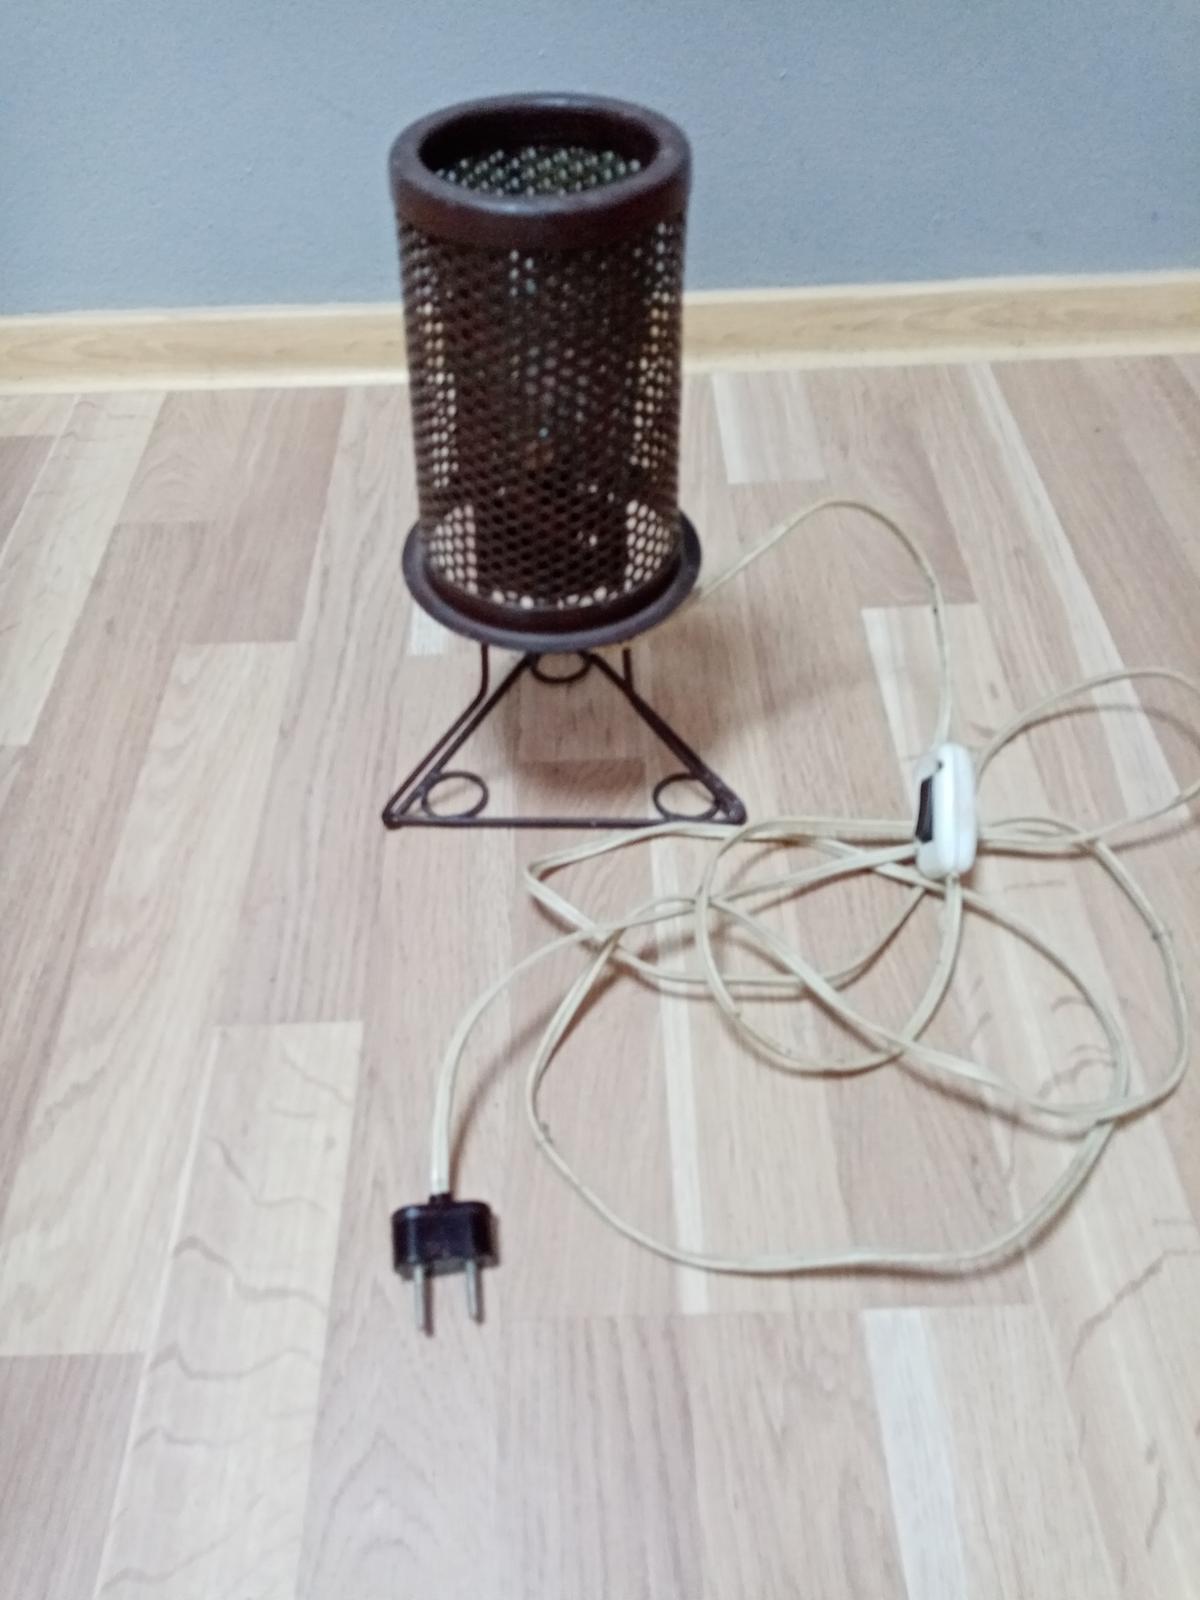 Stolná lampa - priemyselný dizajn - Obrázok č. 1